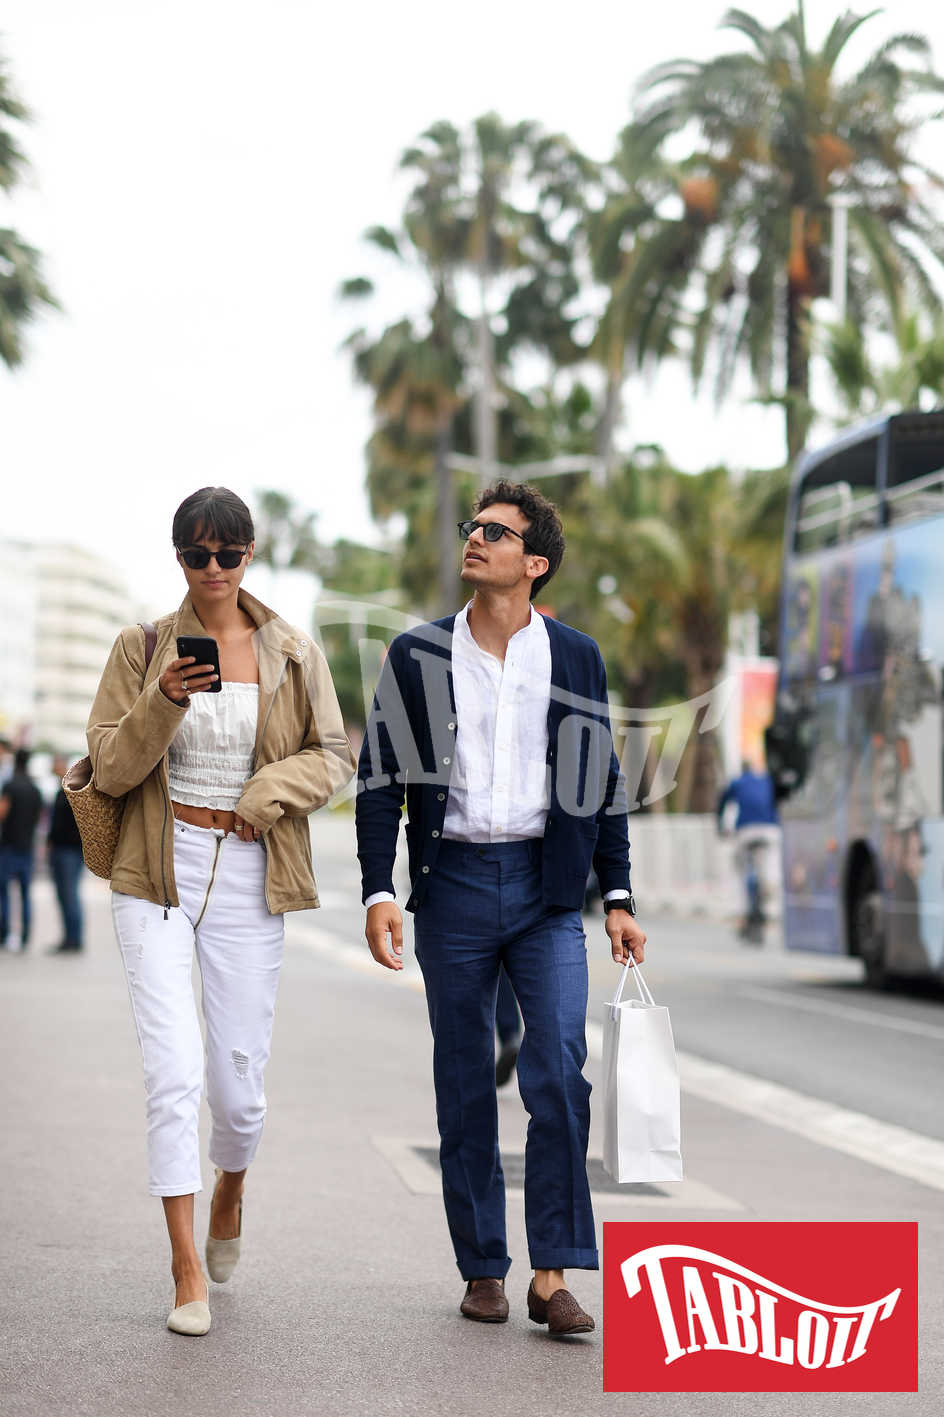 Riccardo Pozzoli e Gabrielle Caunesil a cannes